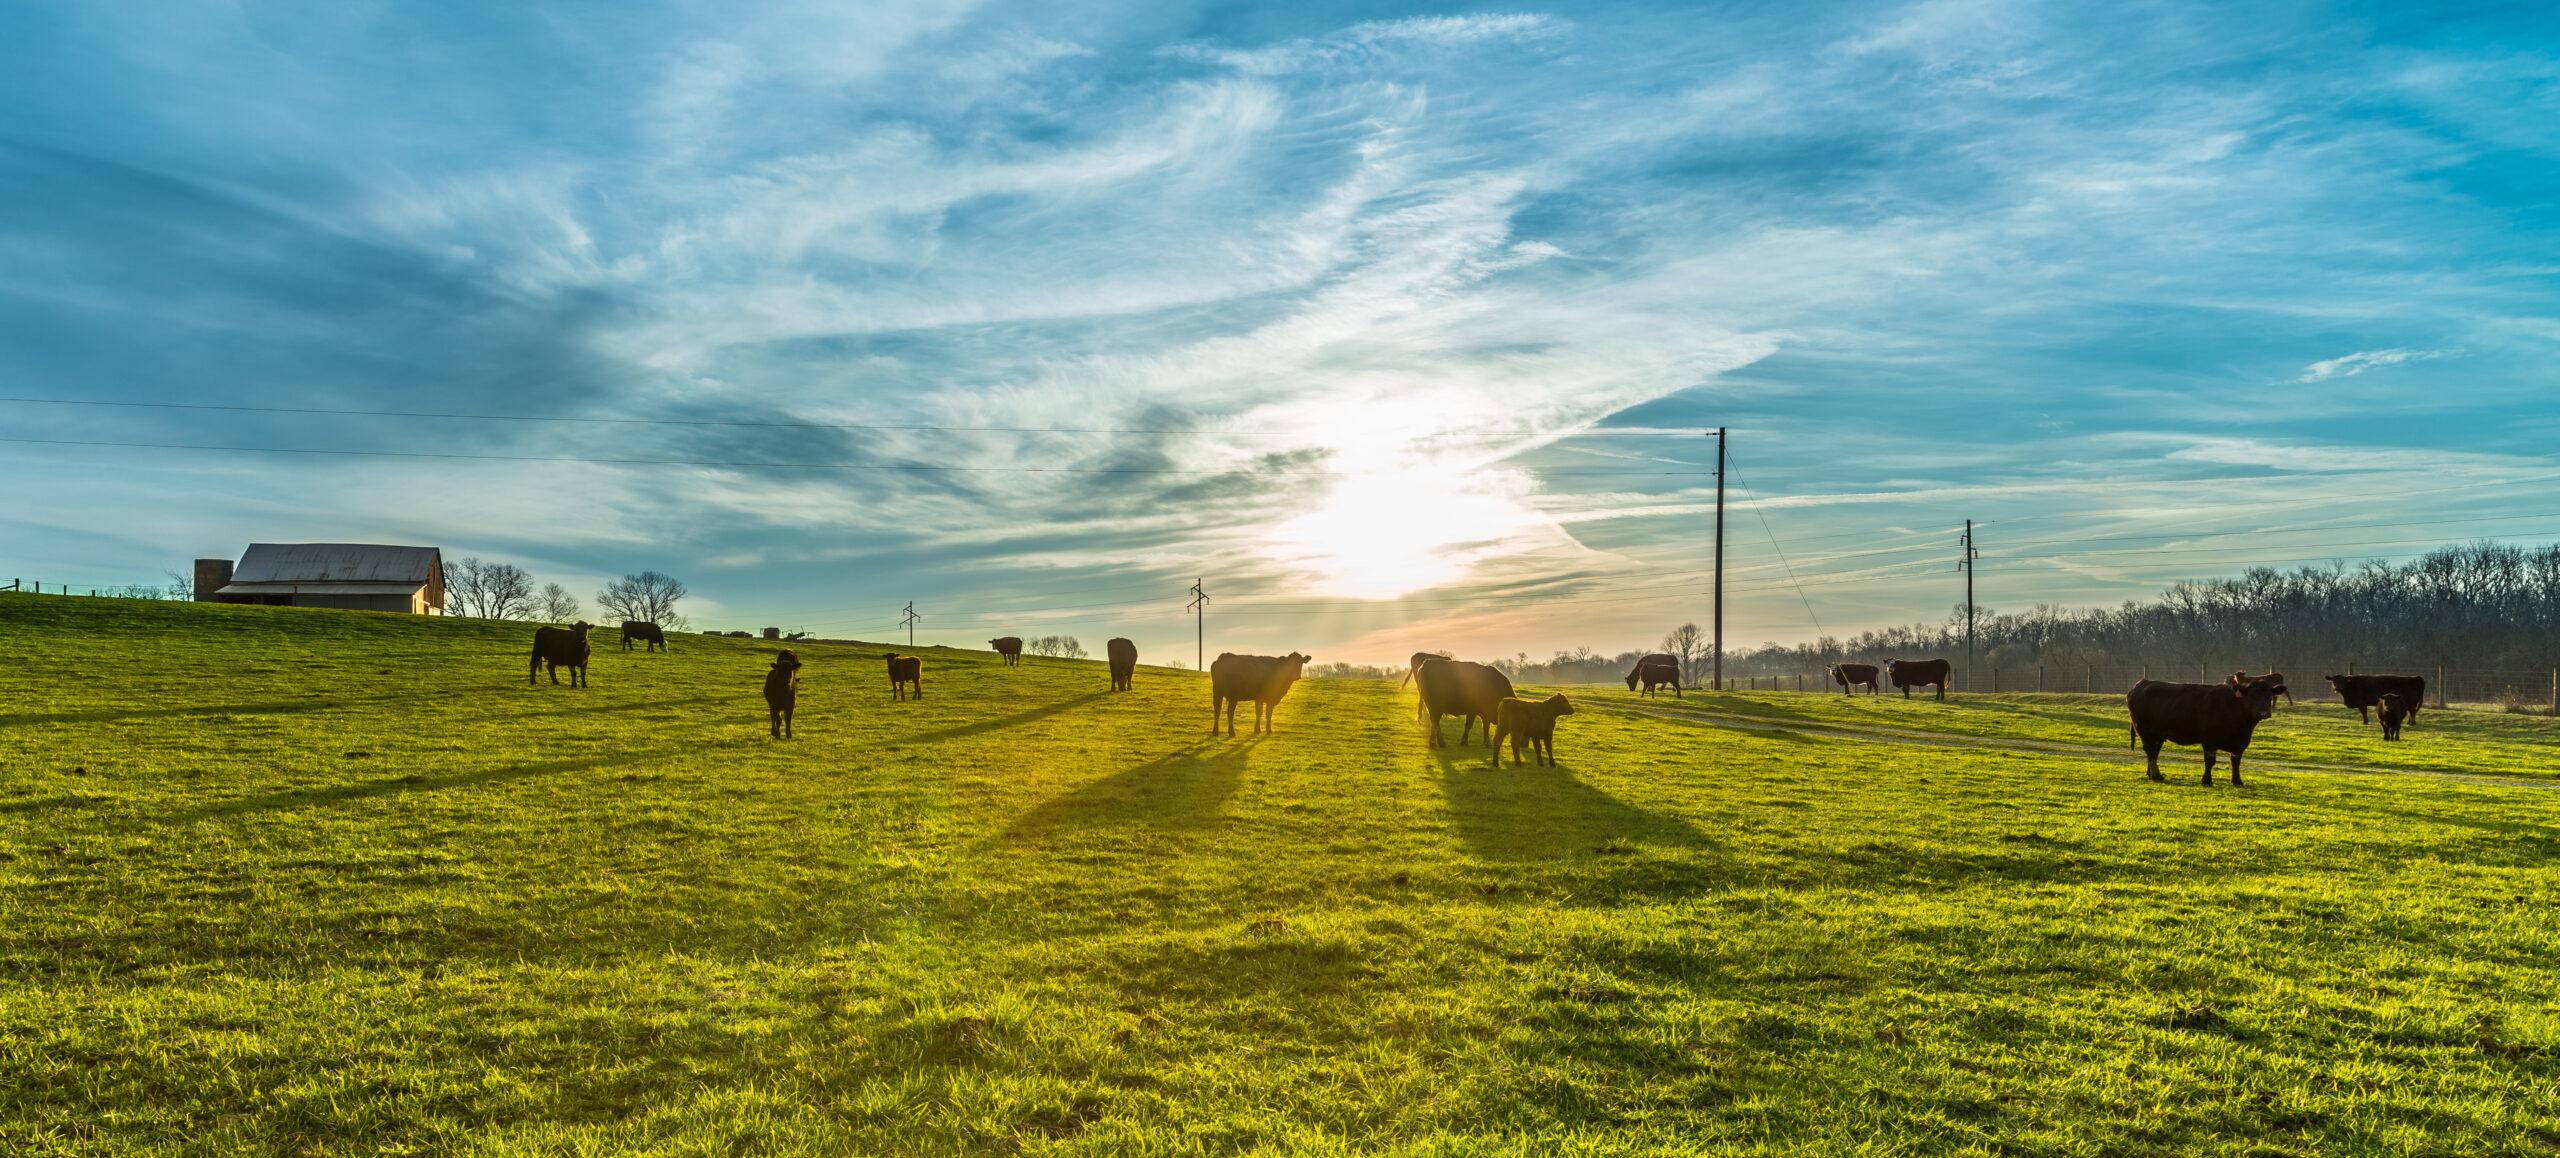 farm sustainability